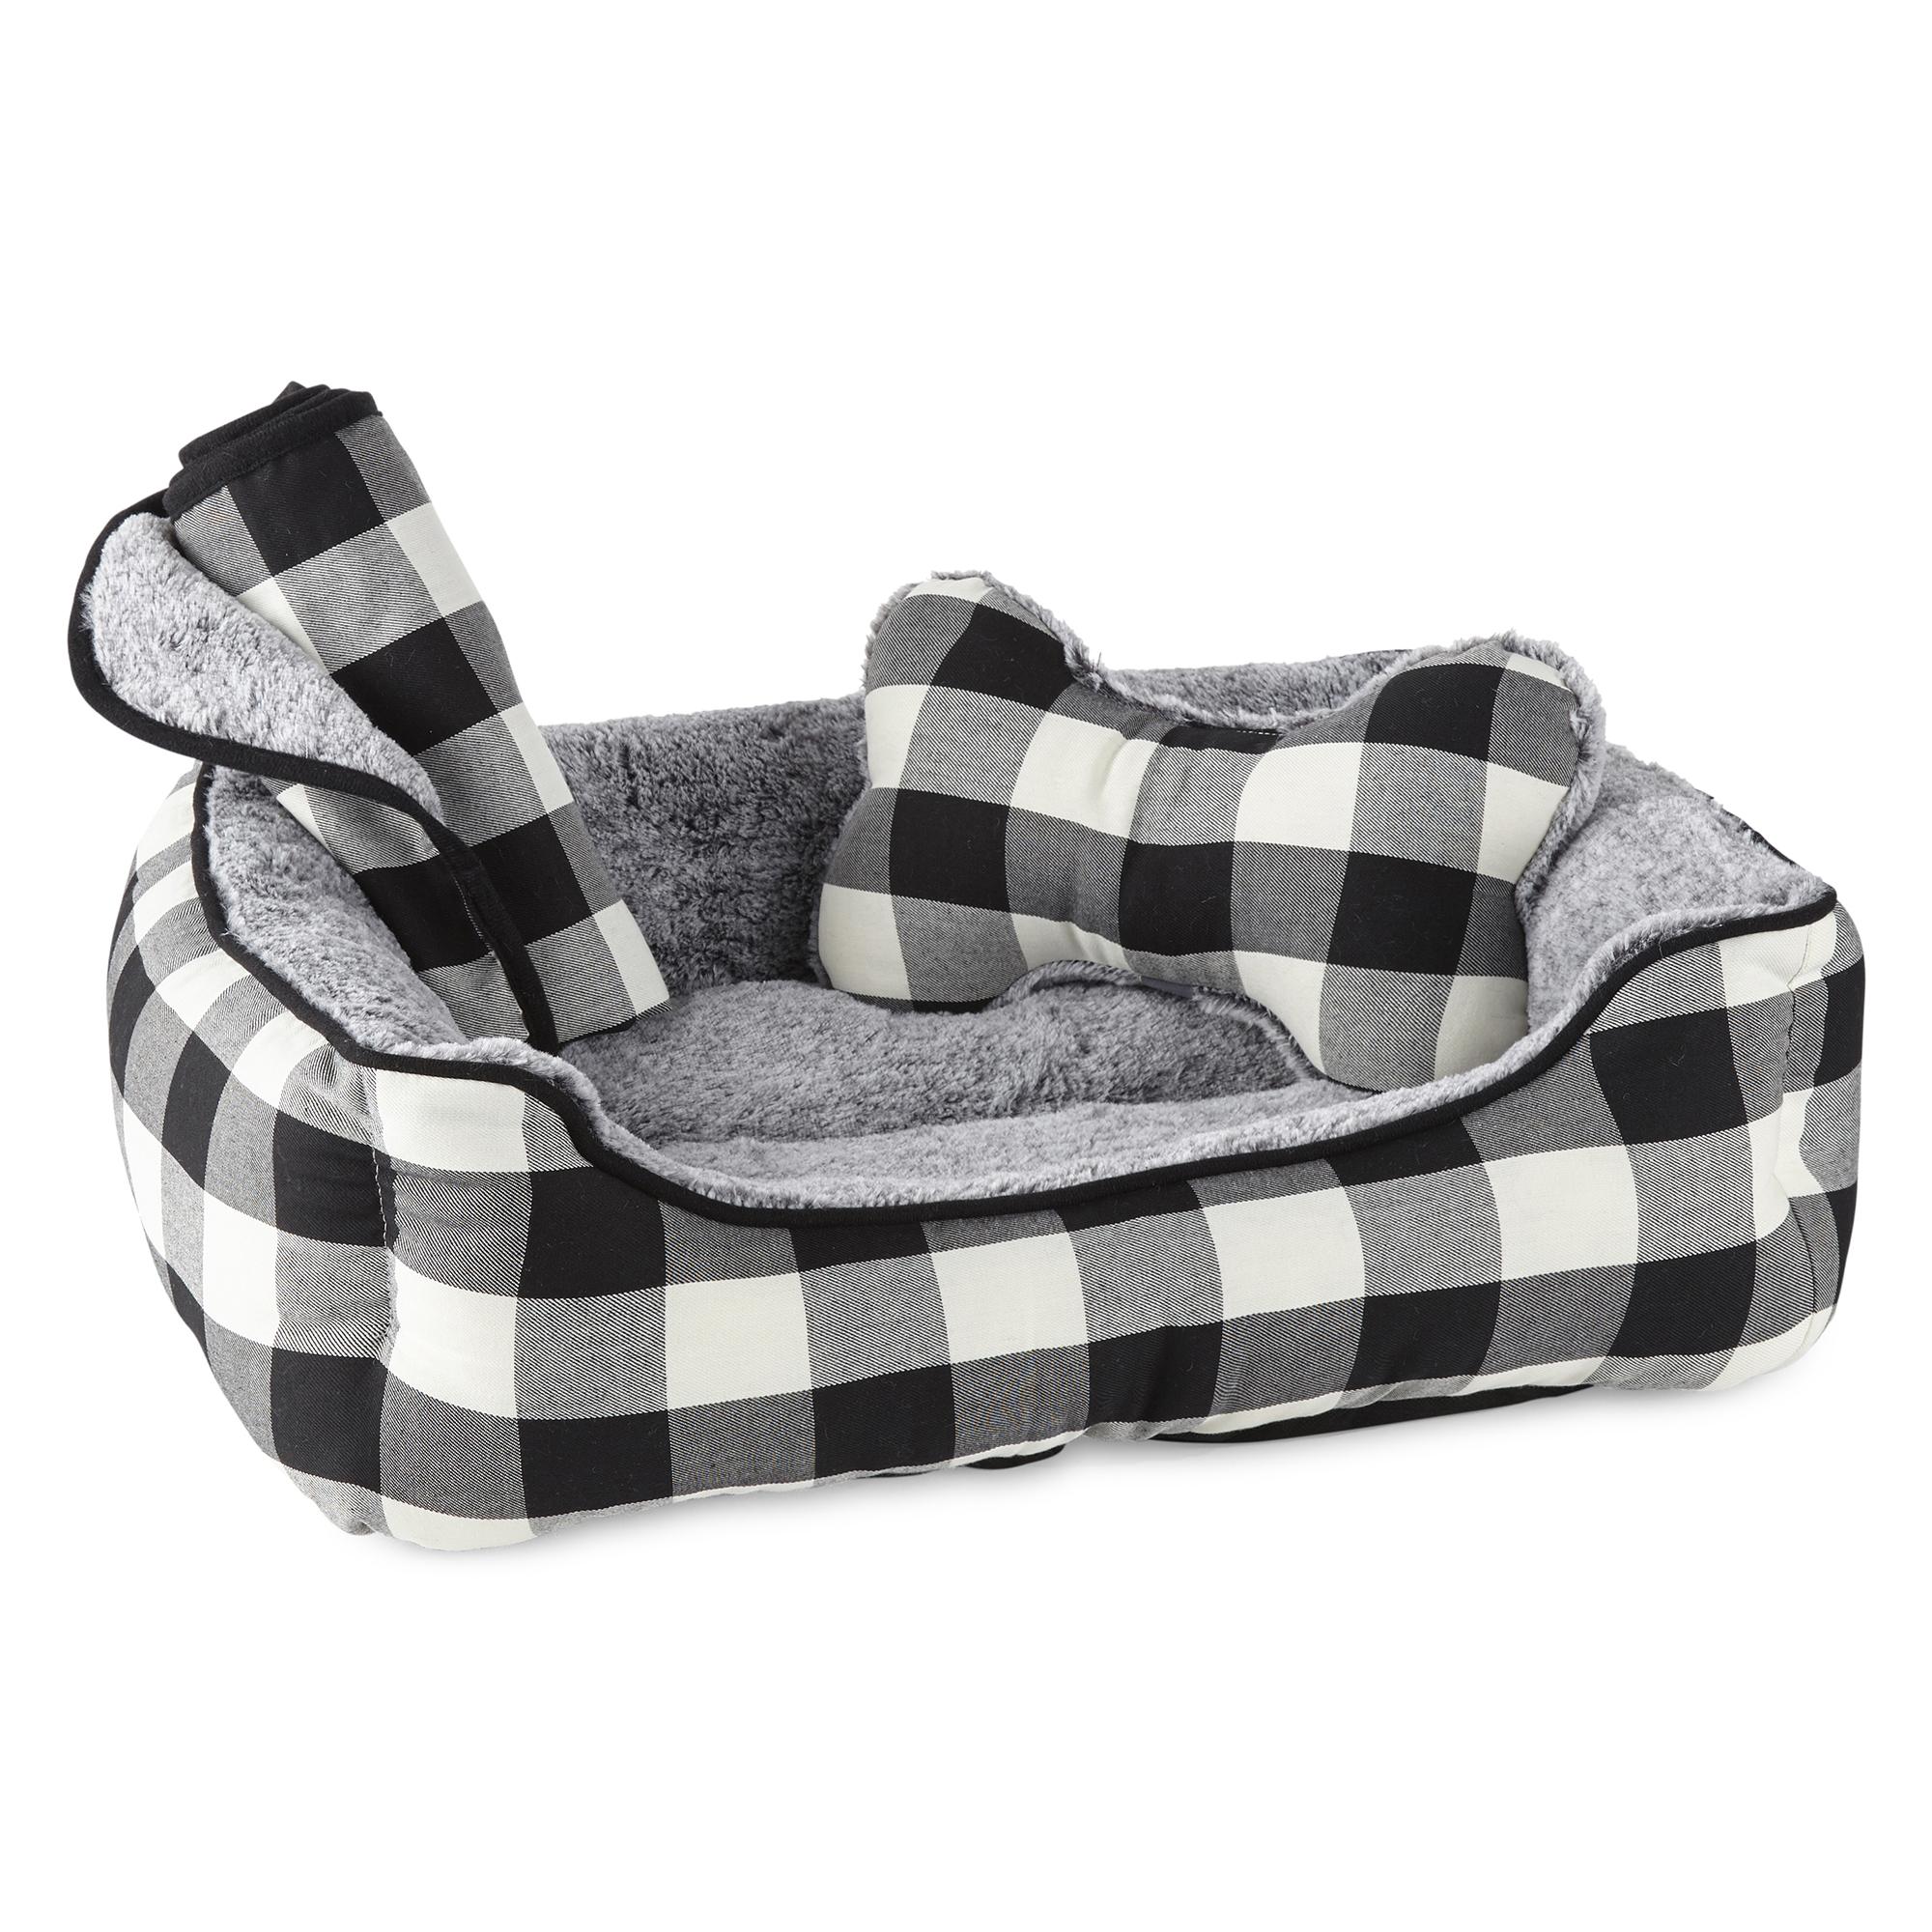 PAW & TAIL Gingham Dog Bed Set